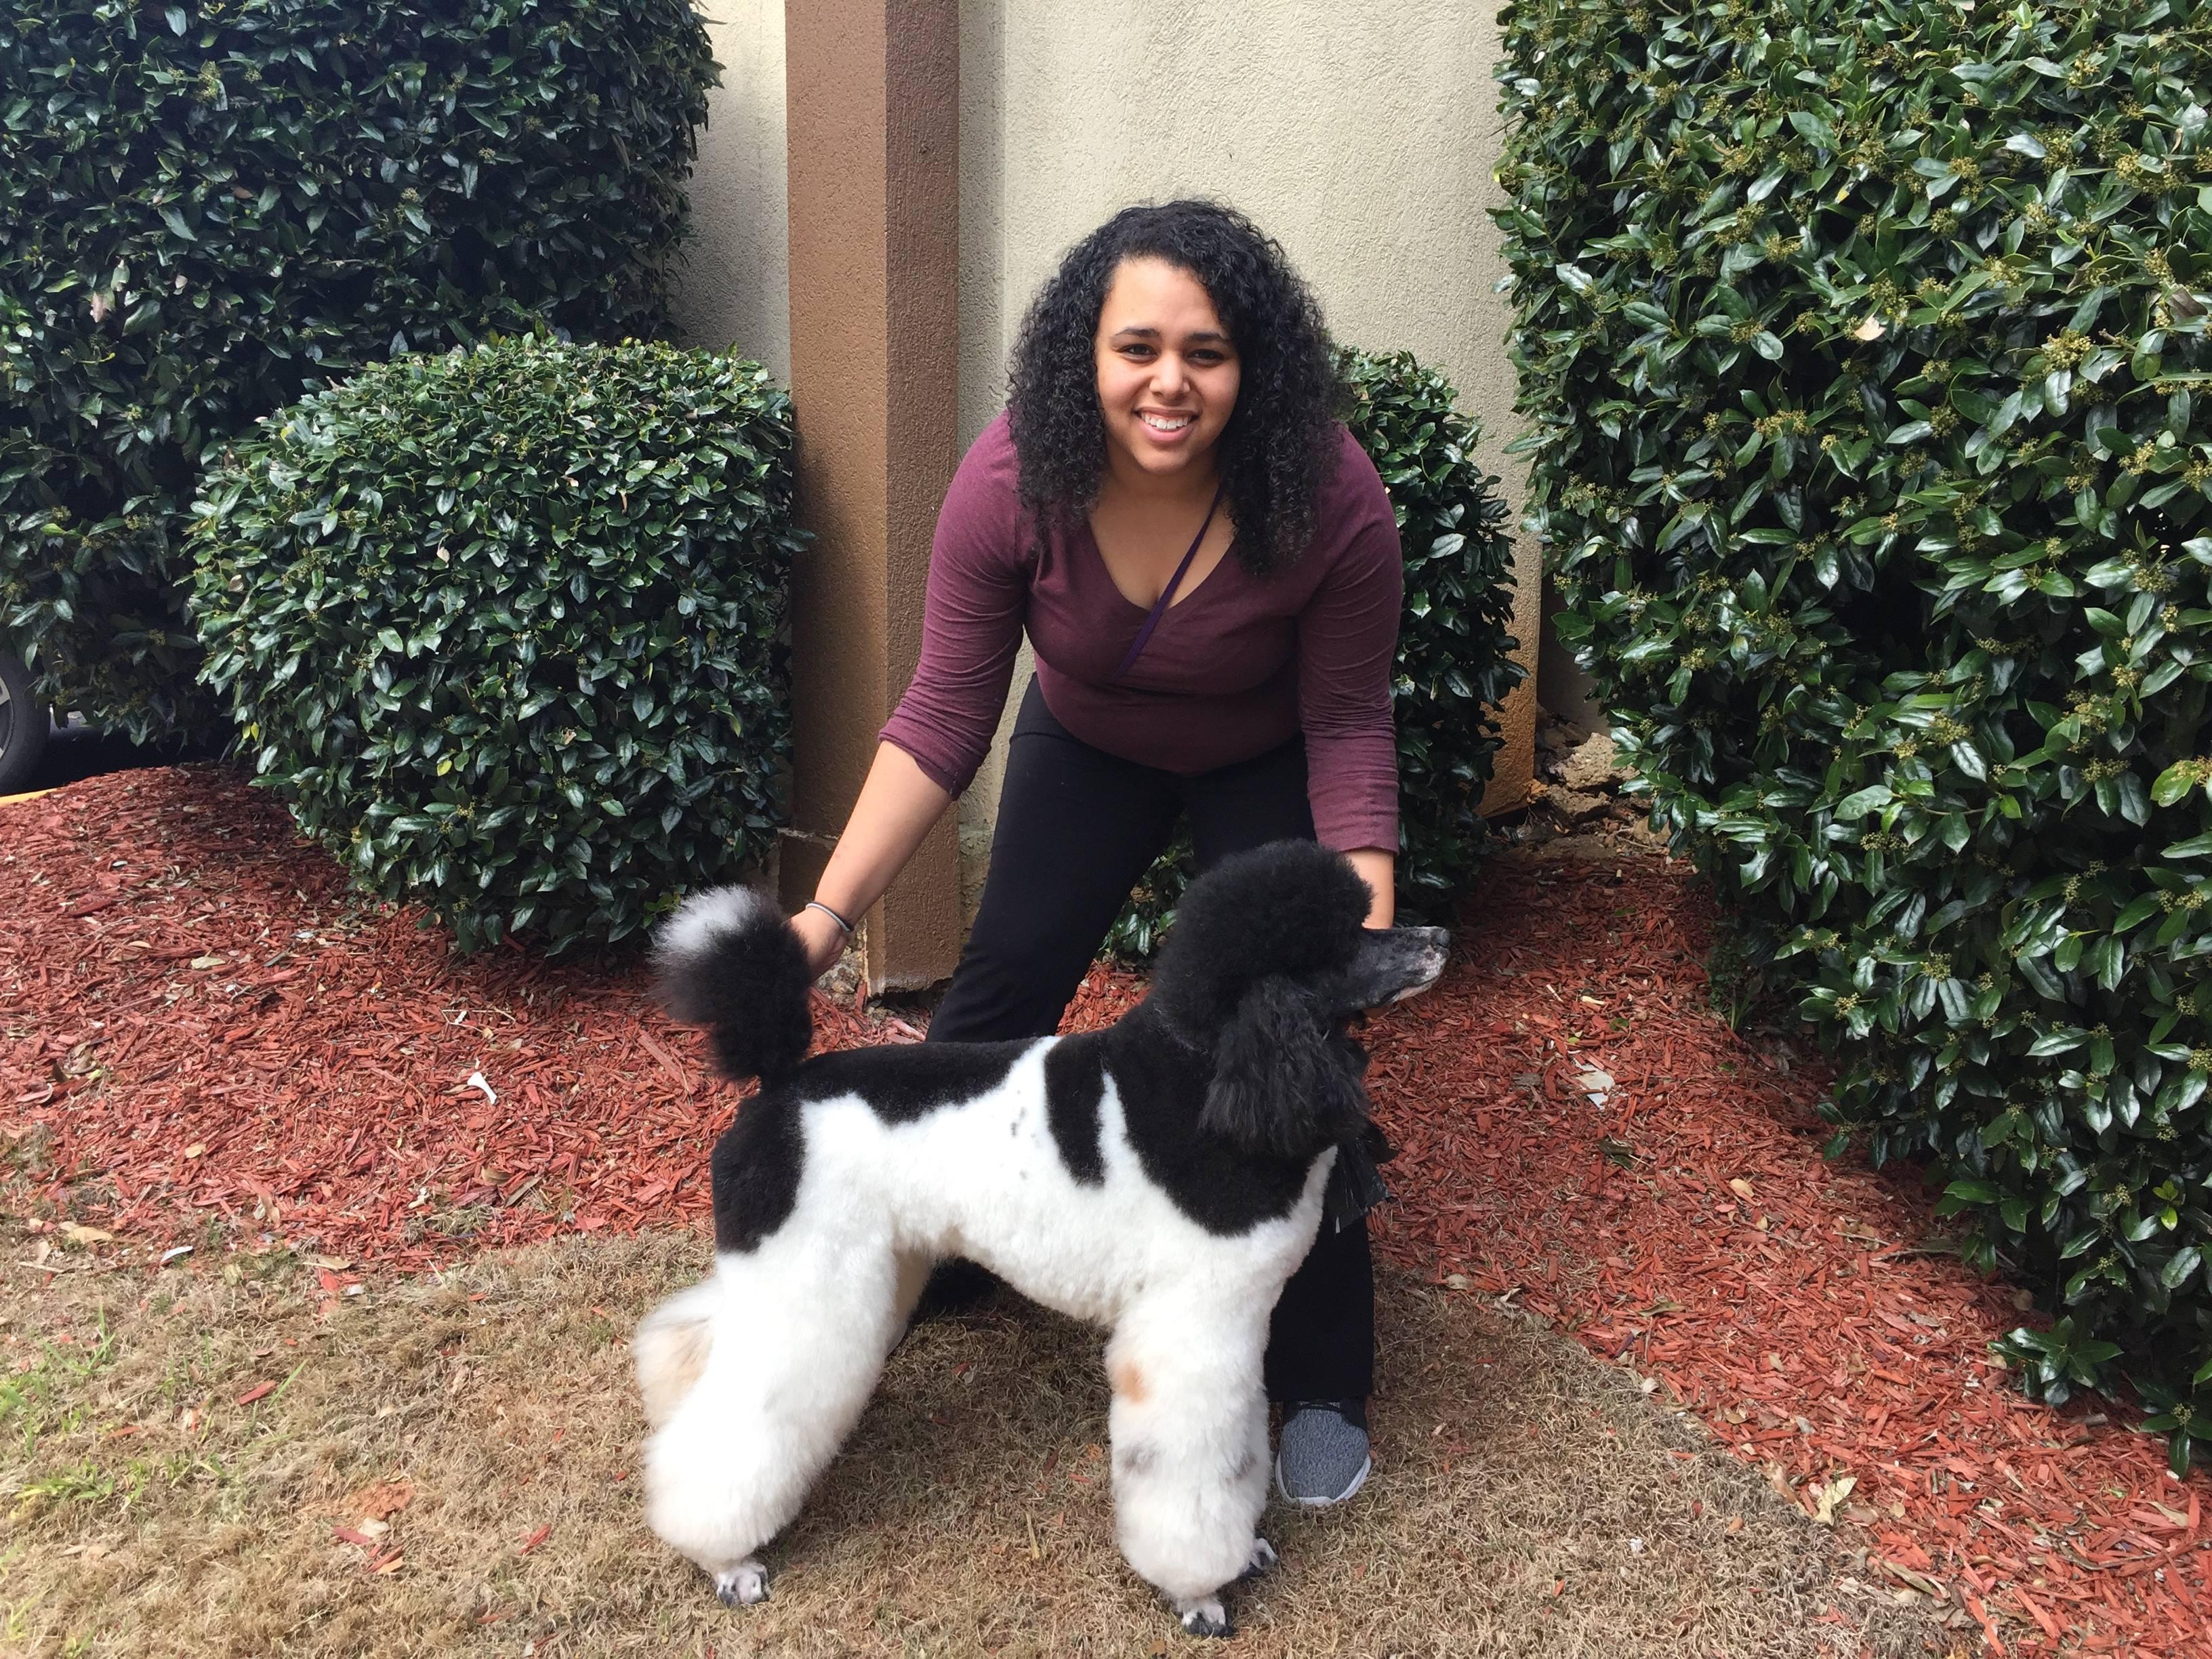 pet grooming, dog, show dog